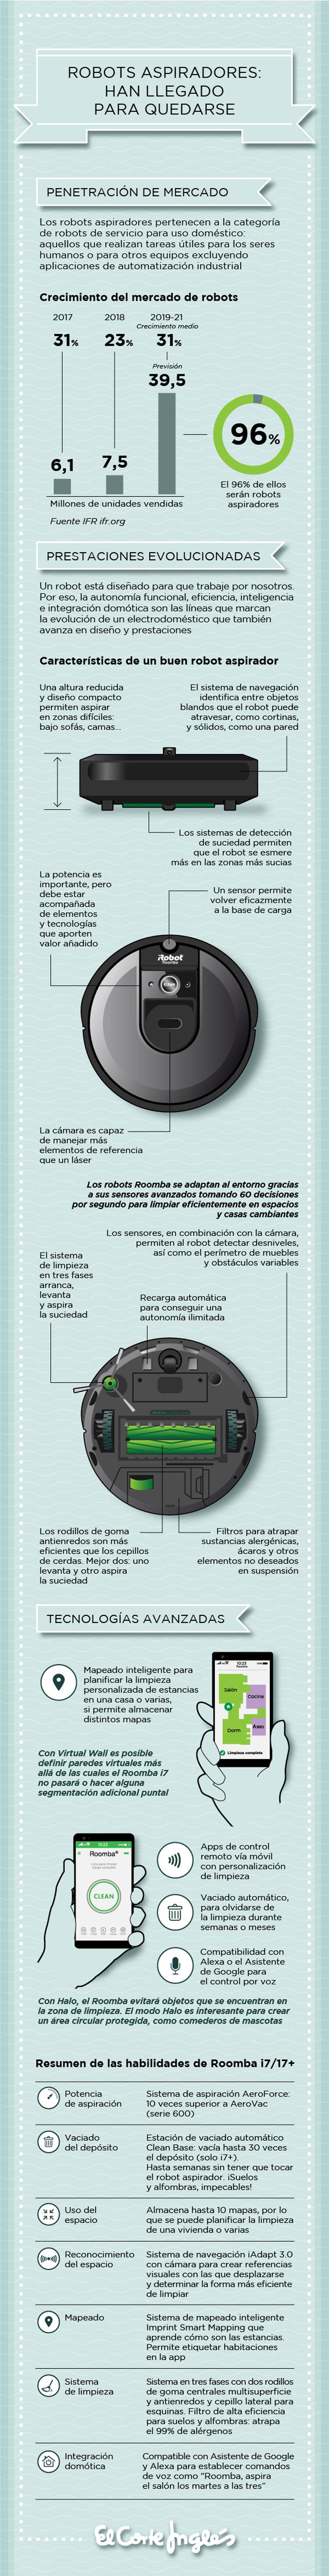 Infografía - Prestaciones que se deben pedir a un robot aspirador